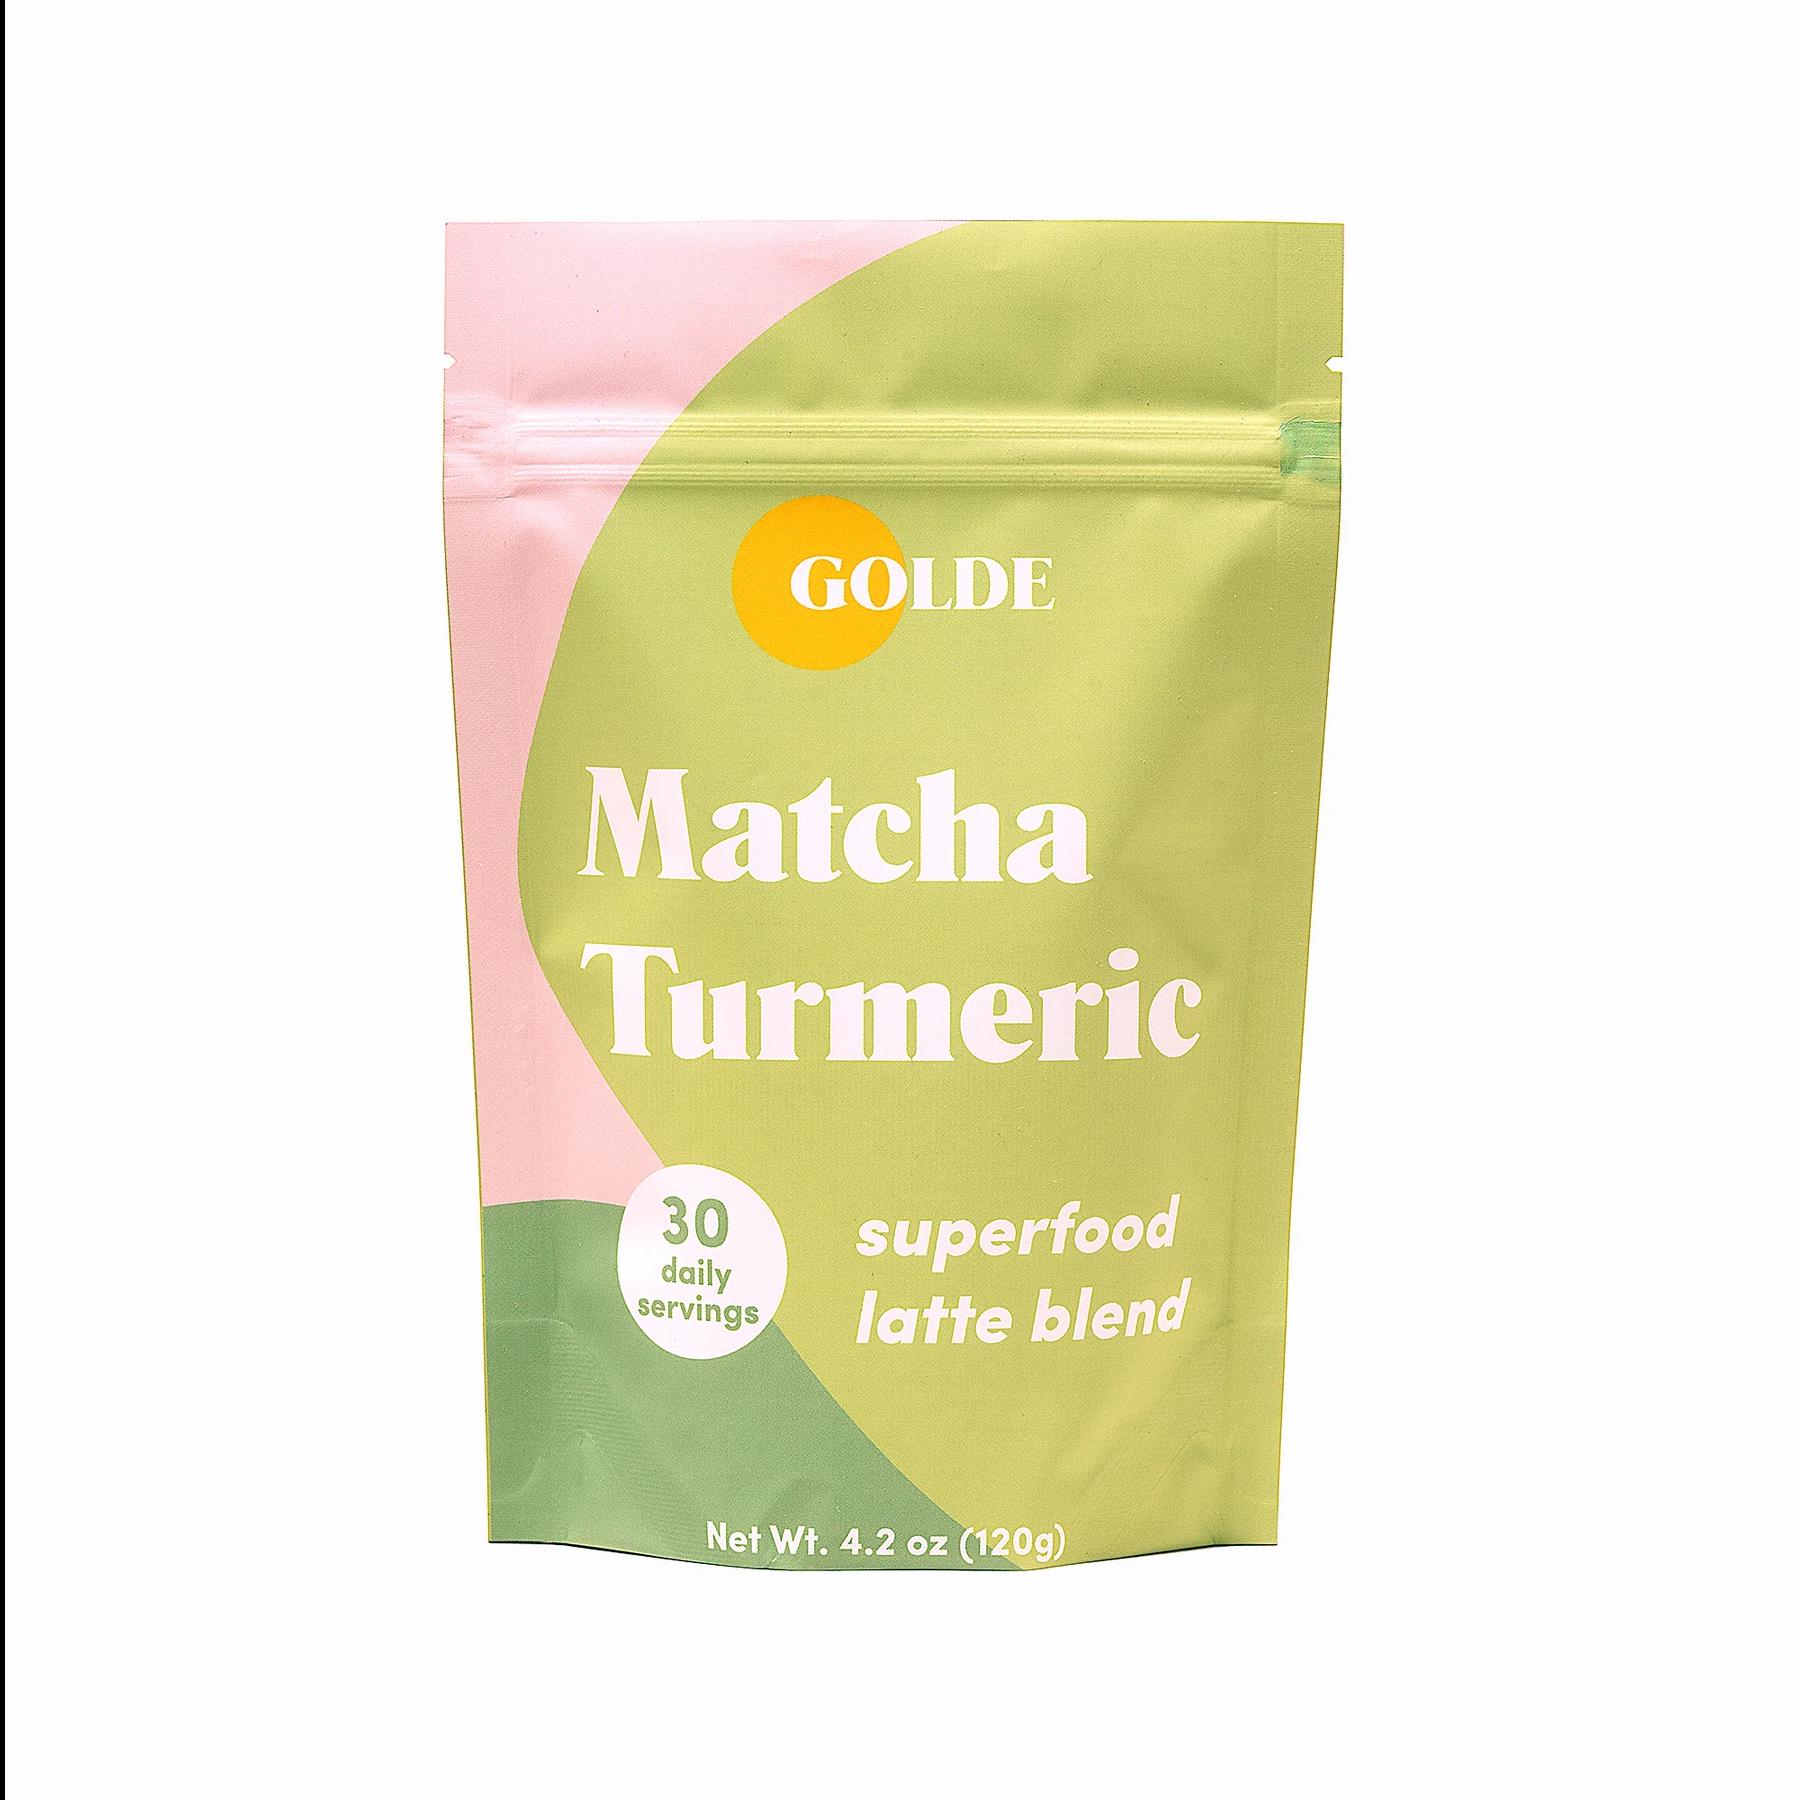 Matcha Turmeric Latte Blend